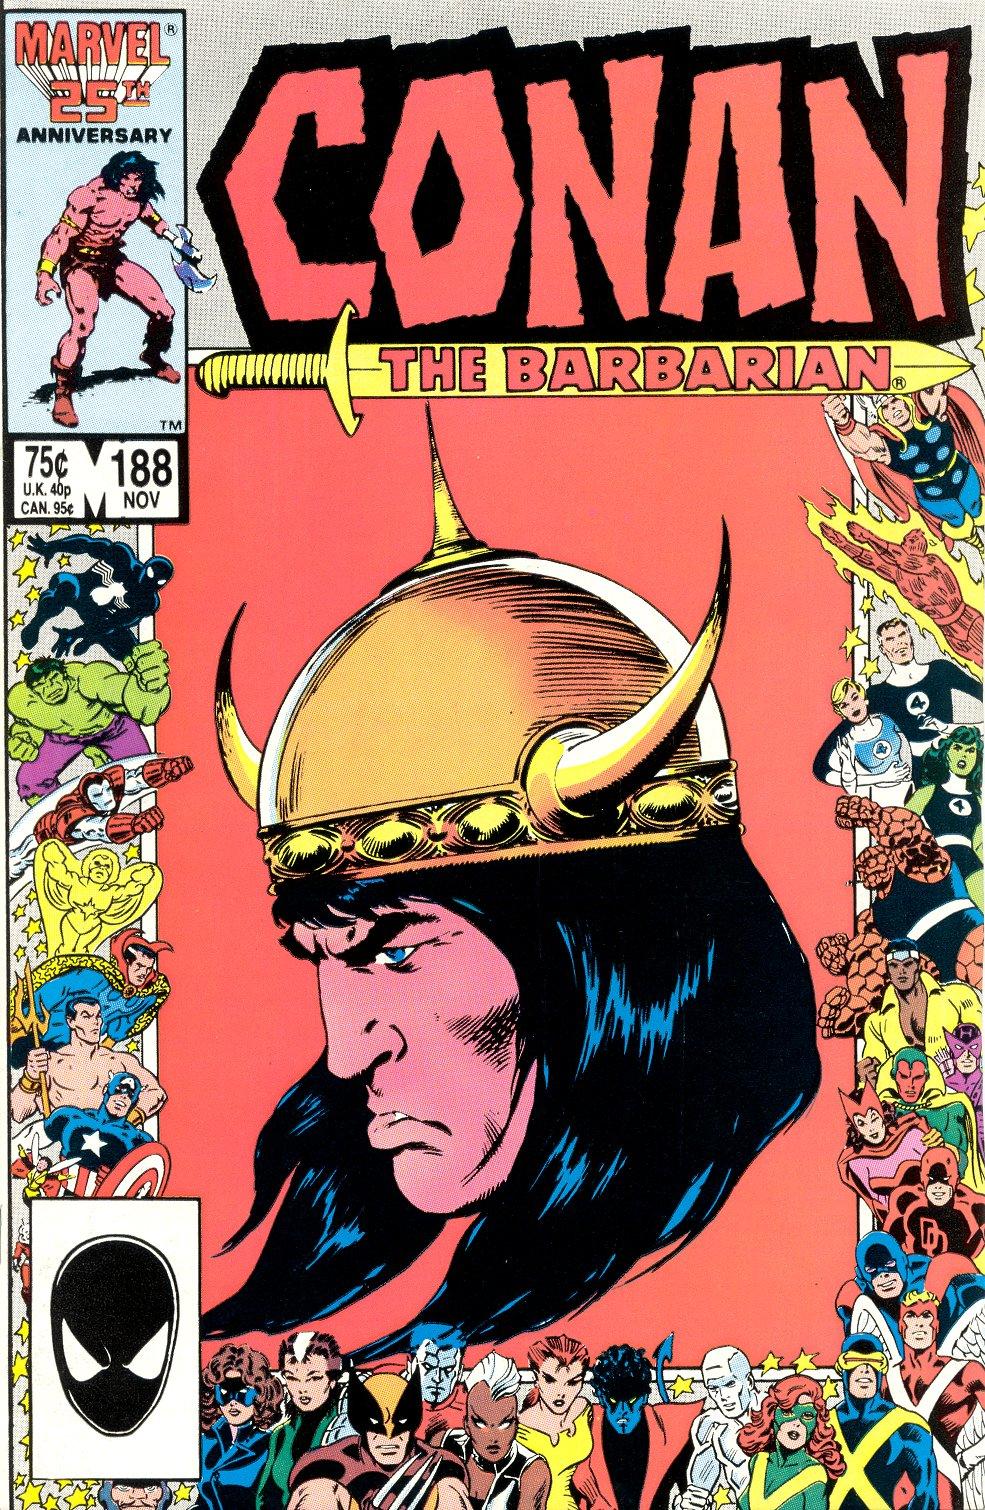 Conan the Barbarian 188